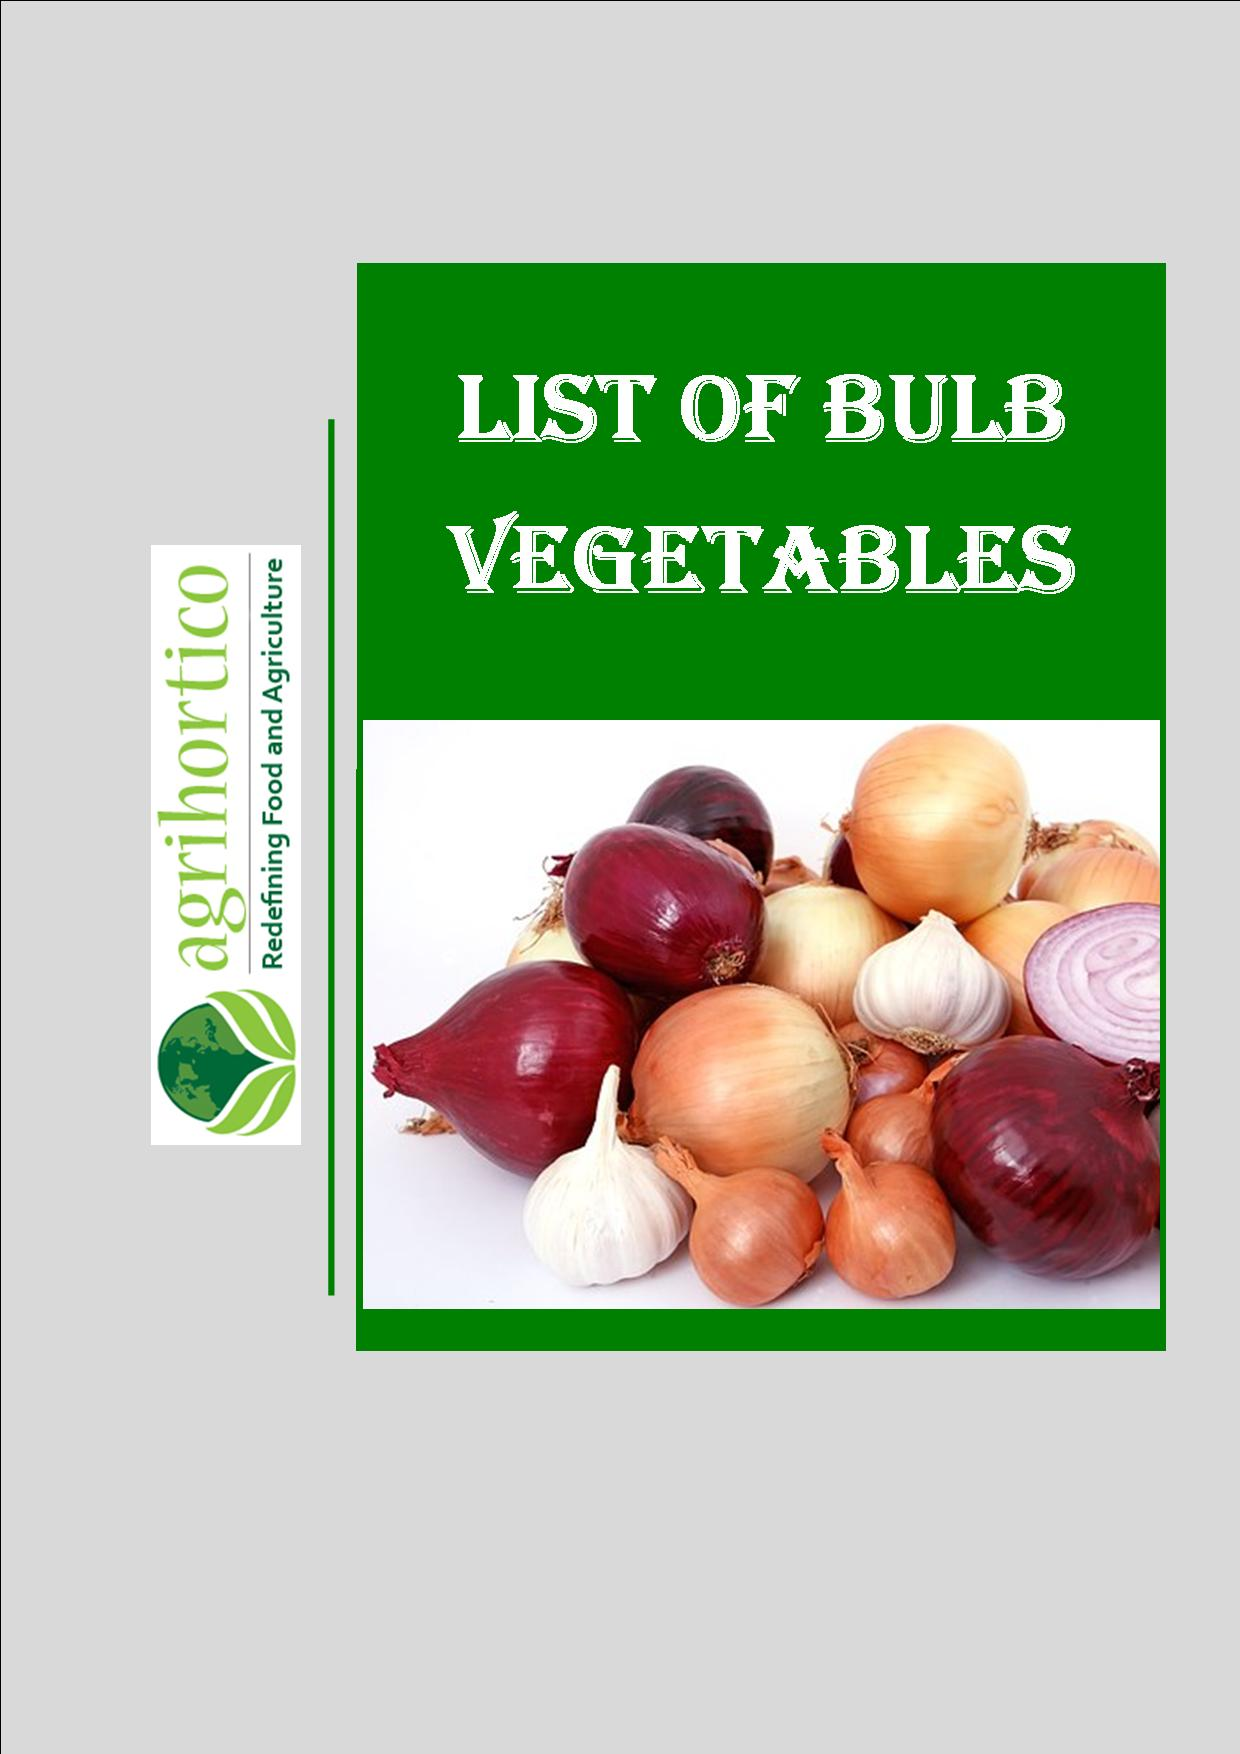 bulb-veg